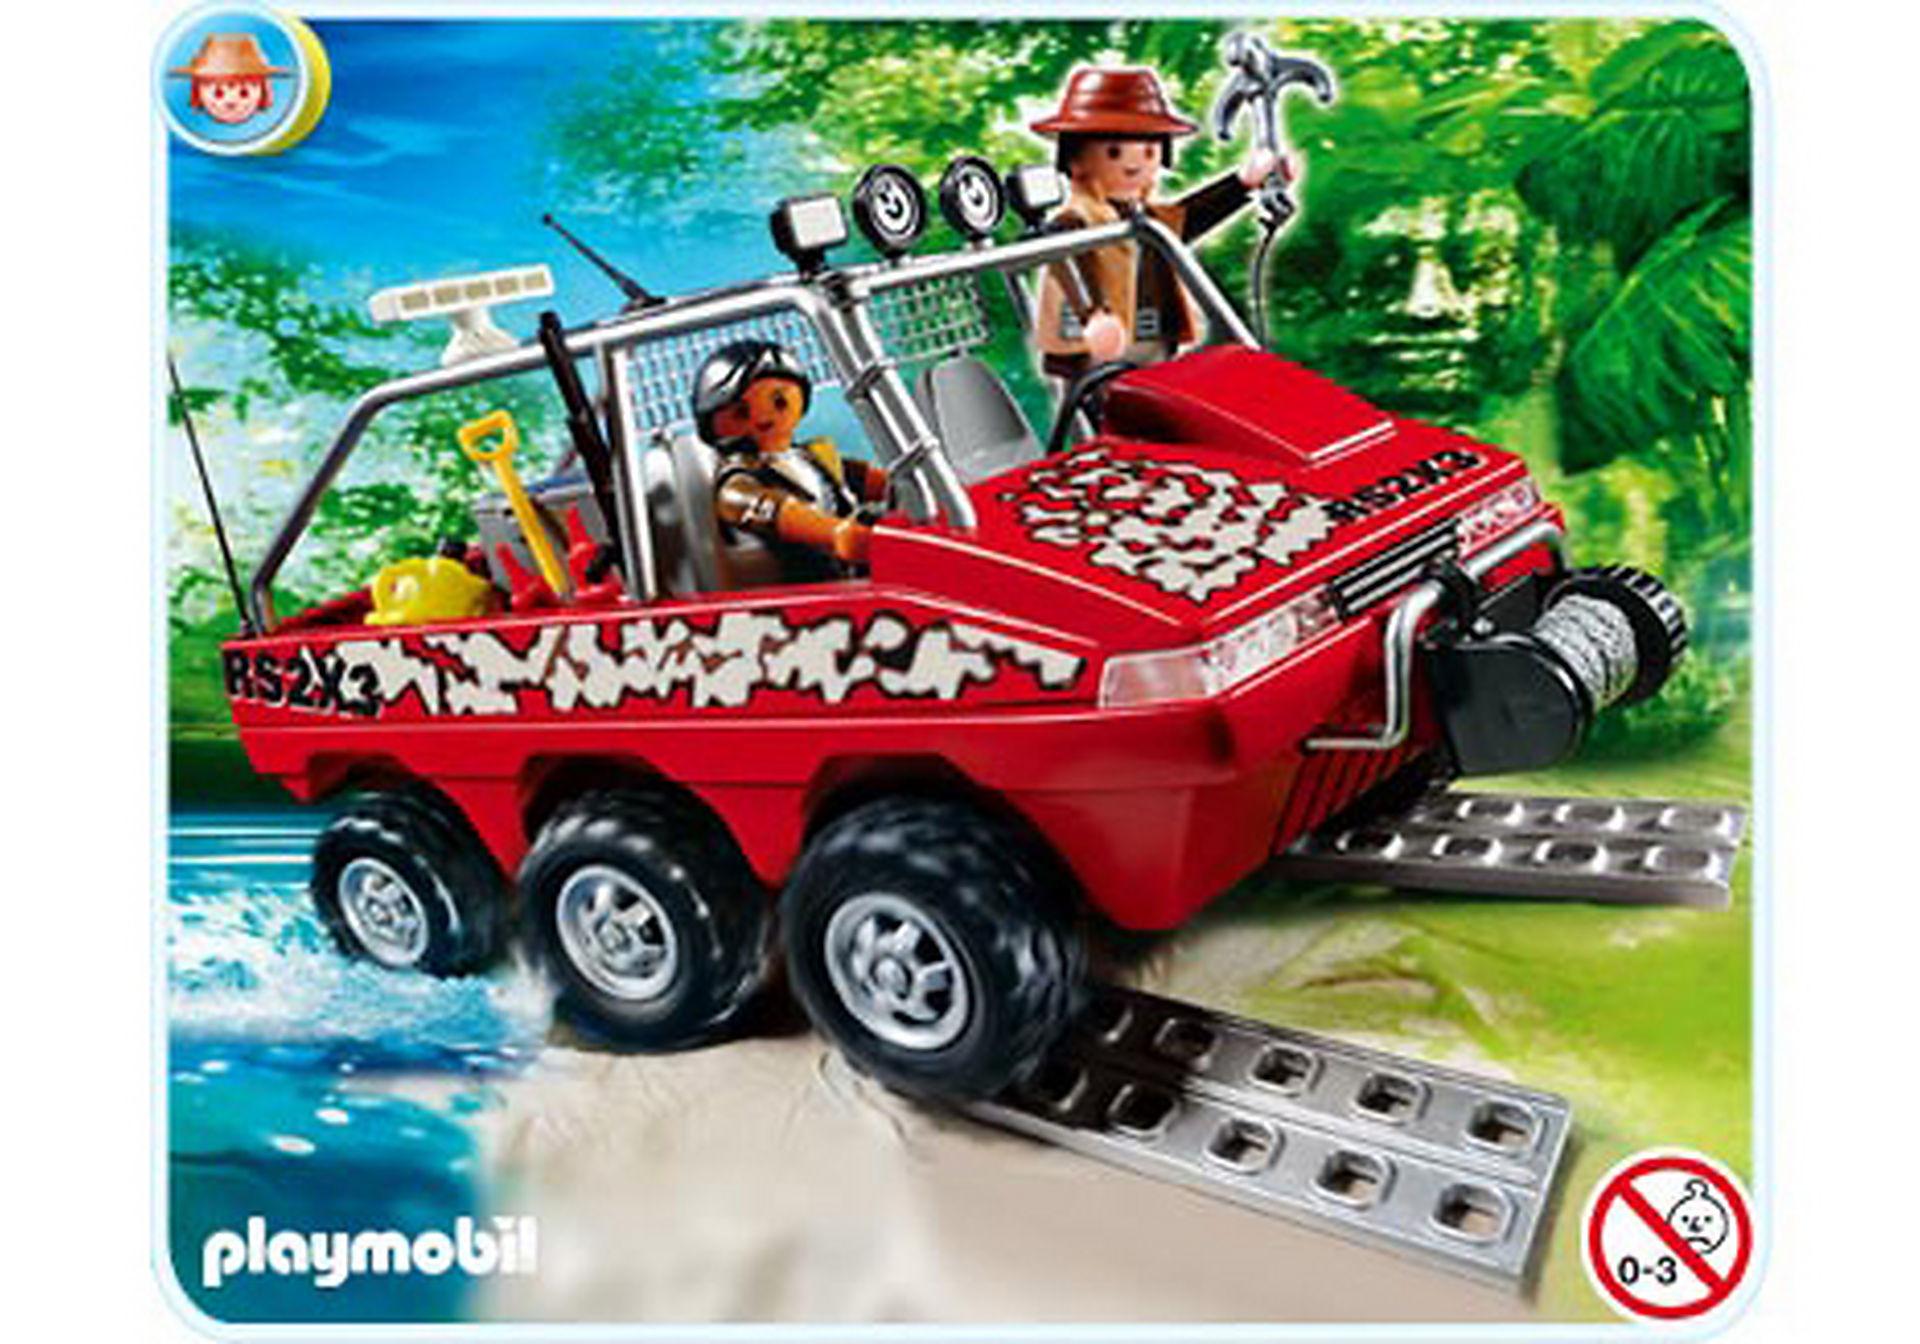 http://media.playmobil.com/i/playmobil/4844-A_product_detail/Véhicule amphibie avec explorateurs